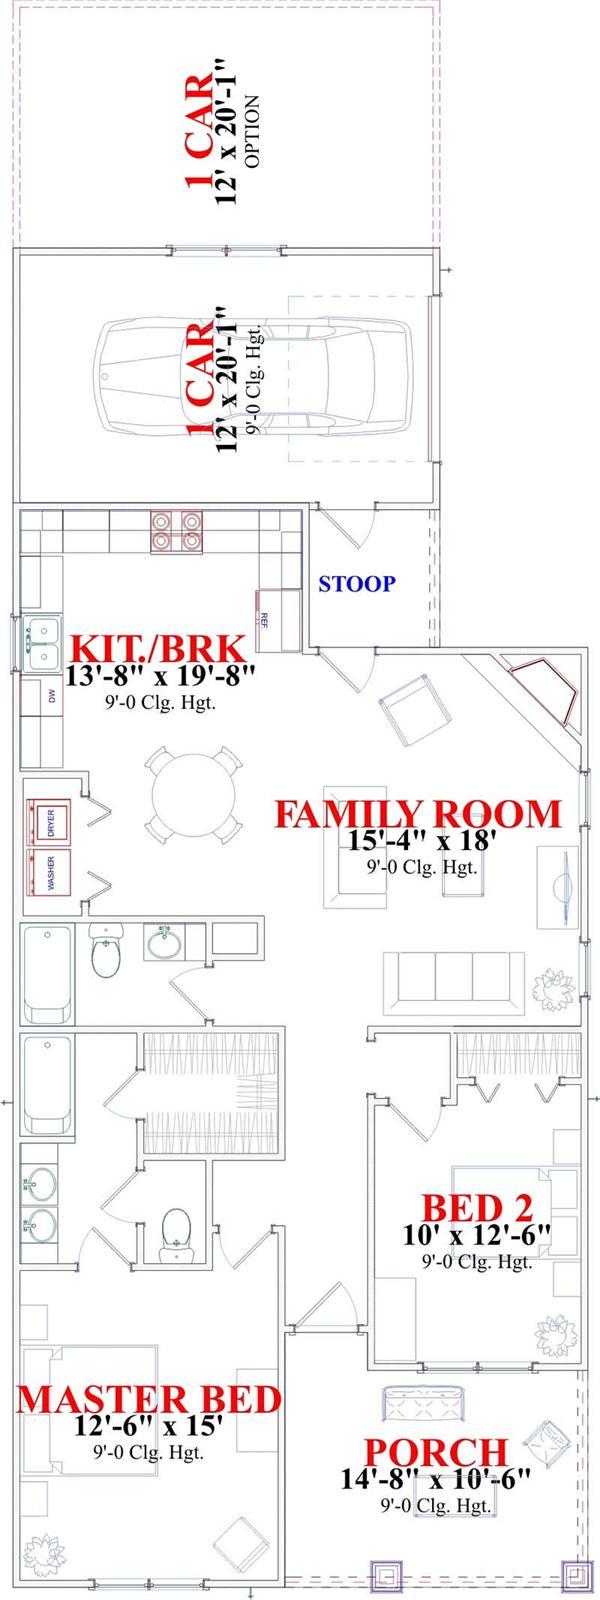 HOME PLAN 3